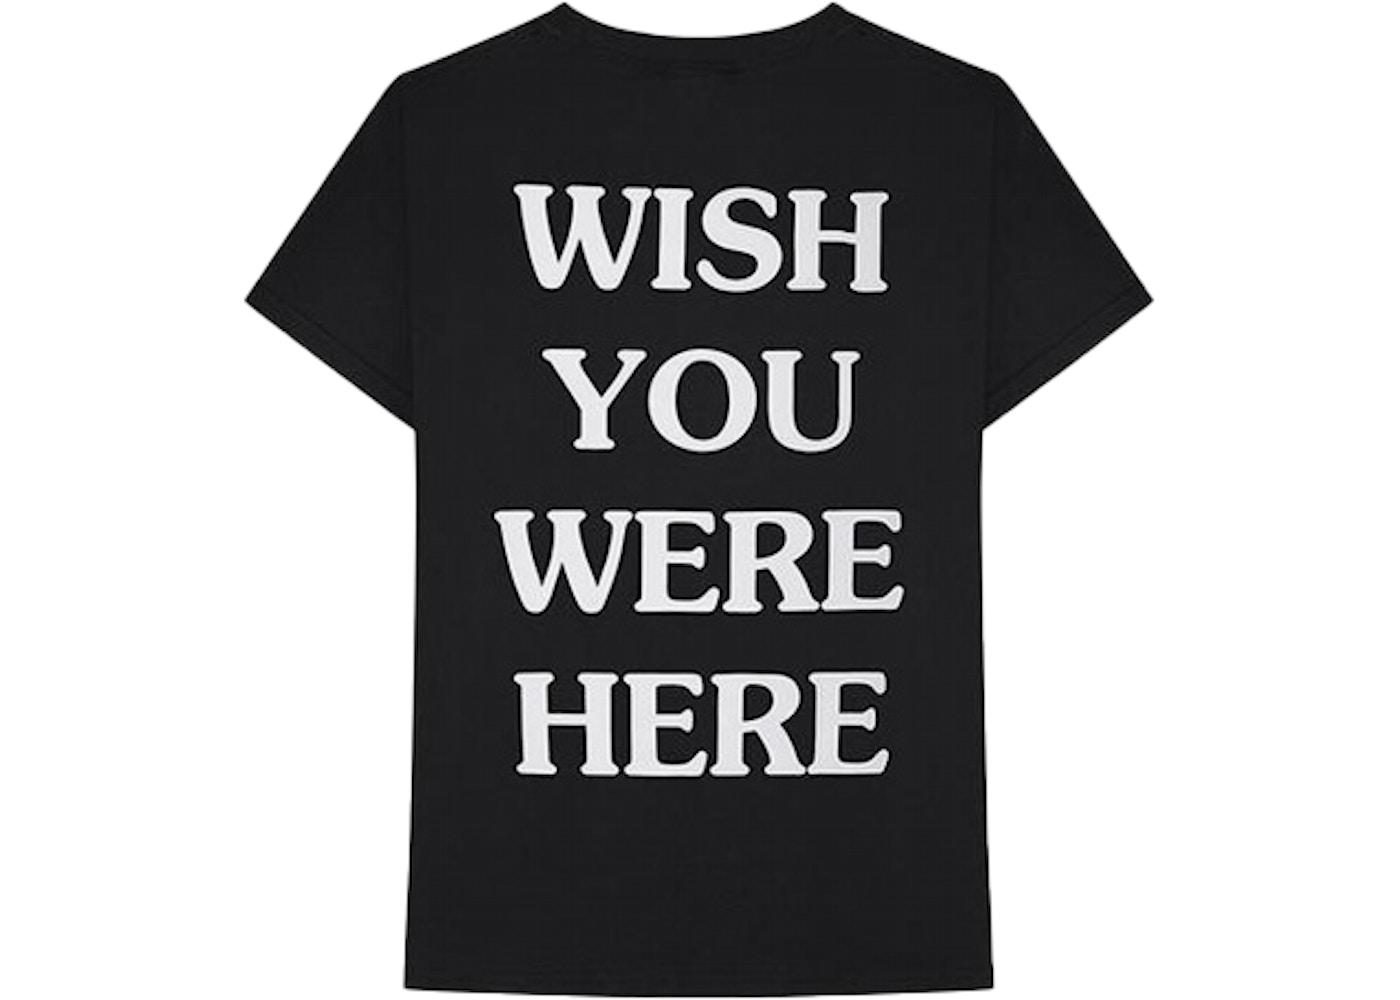 8d855a873fa4 Travis Scott Astroworld Wish You Were Here Tee Black - FW18